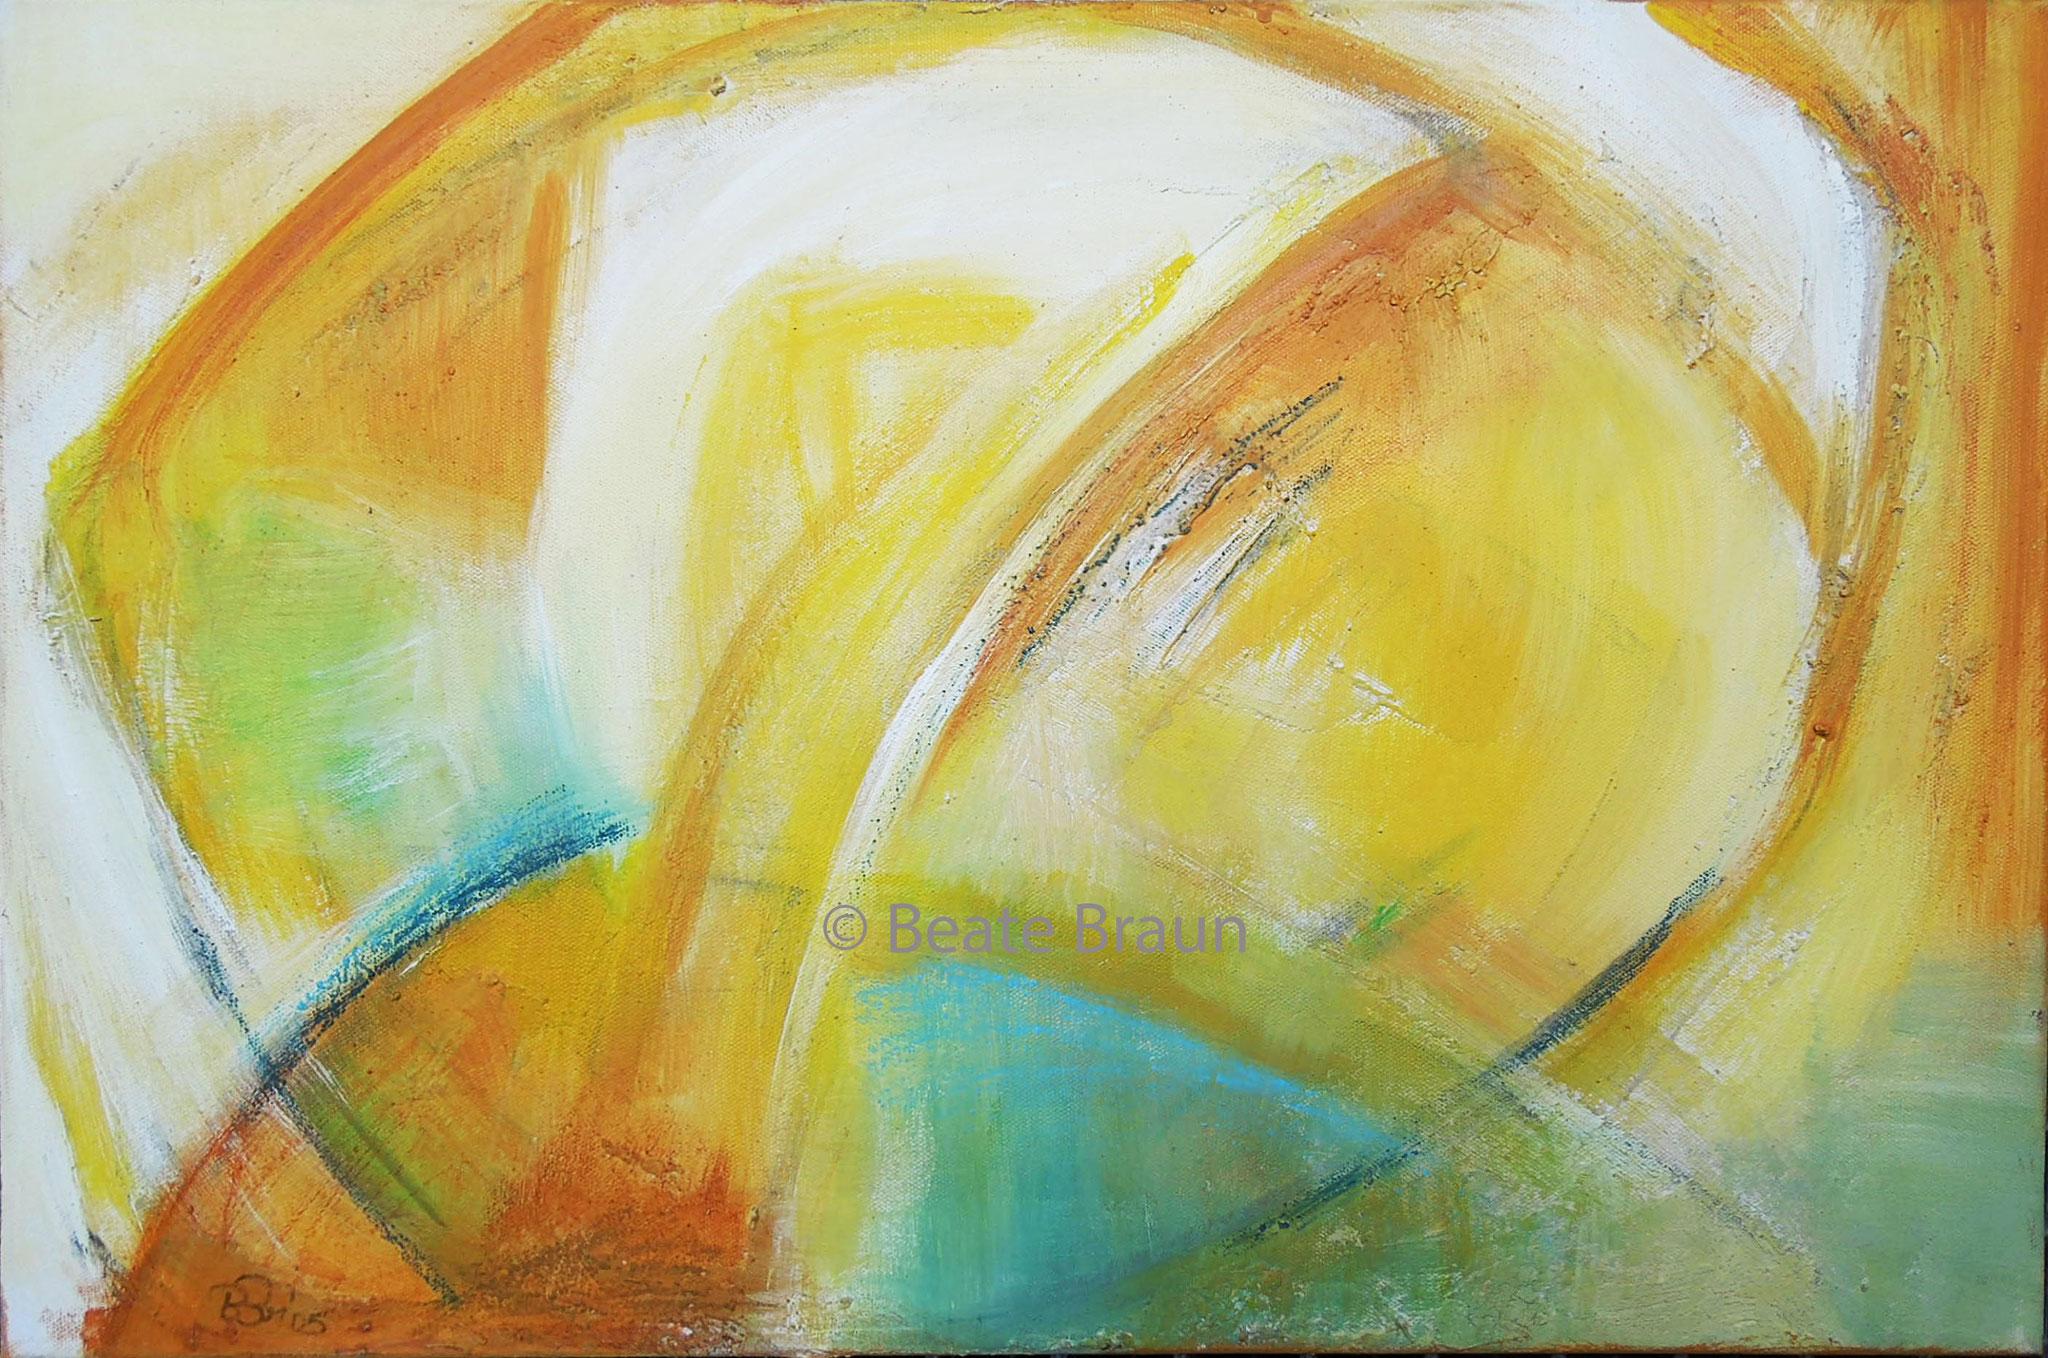 Brücke ins Licht | 60 x 40 cm | Acryl auf Leinwand | 2005